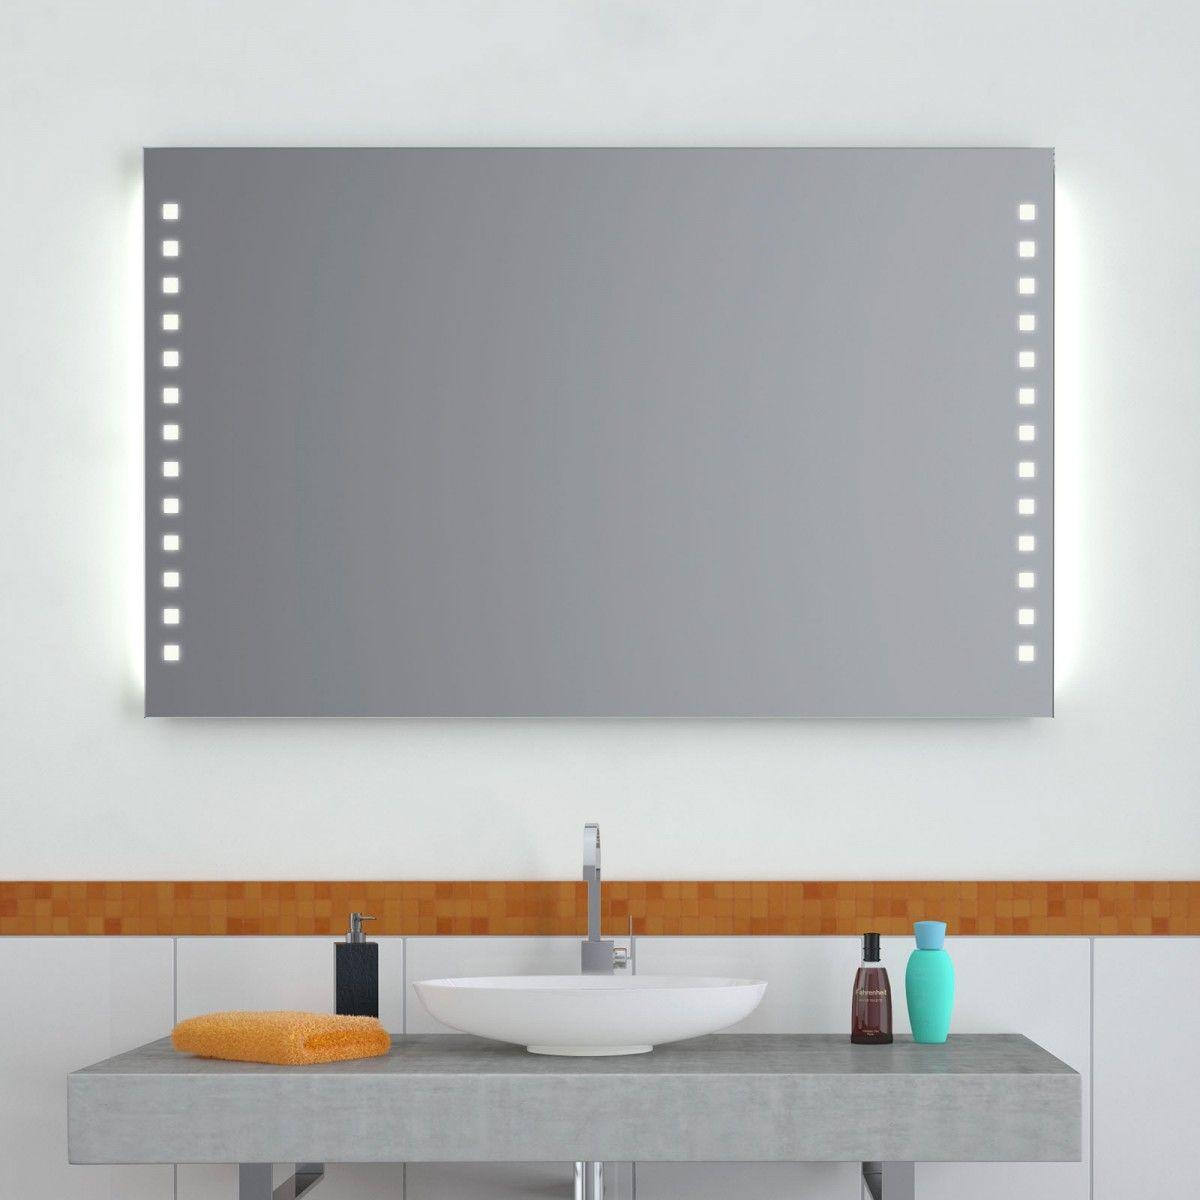 Ayna Ayna Modelleri Ayna Wandspiegel Badspiegel Badspiegel Beleuchtet